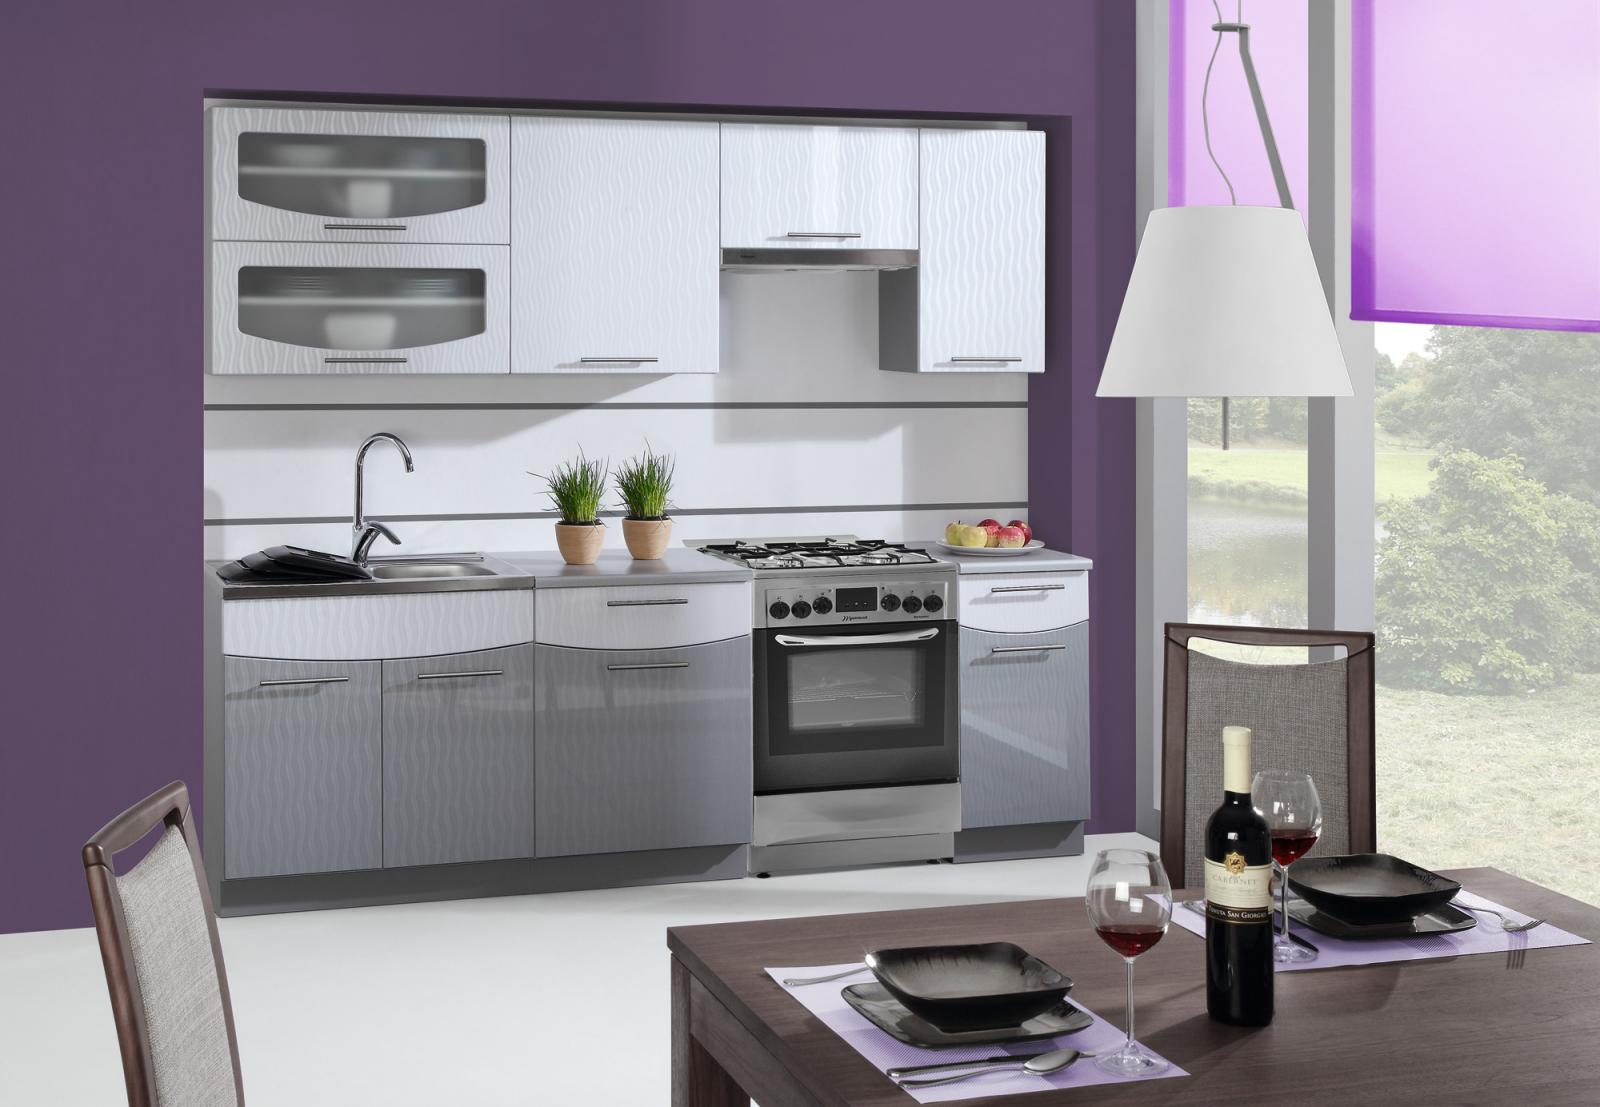 kuchyňská linka SMILE vlnky bílá/šedá